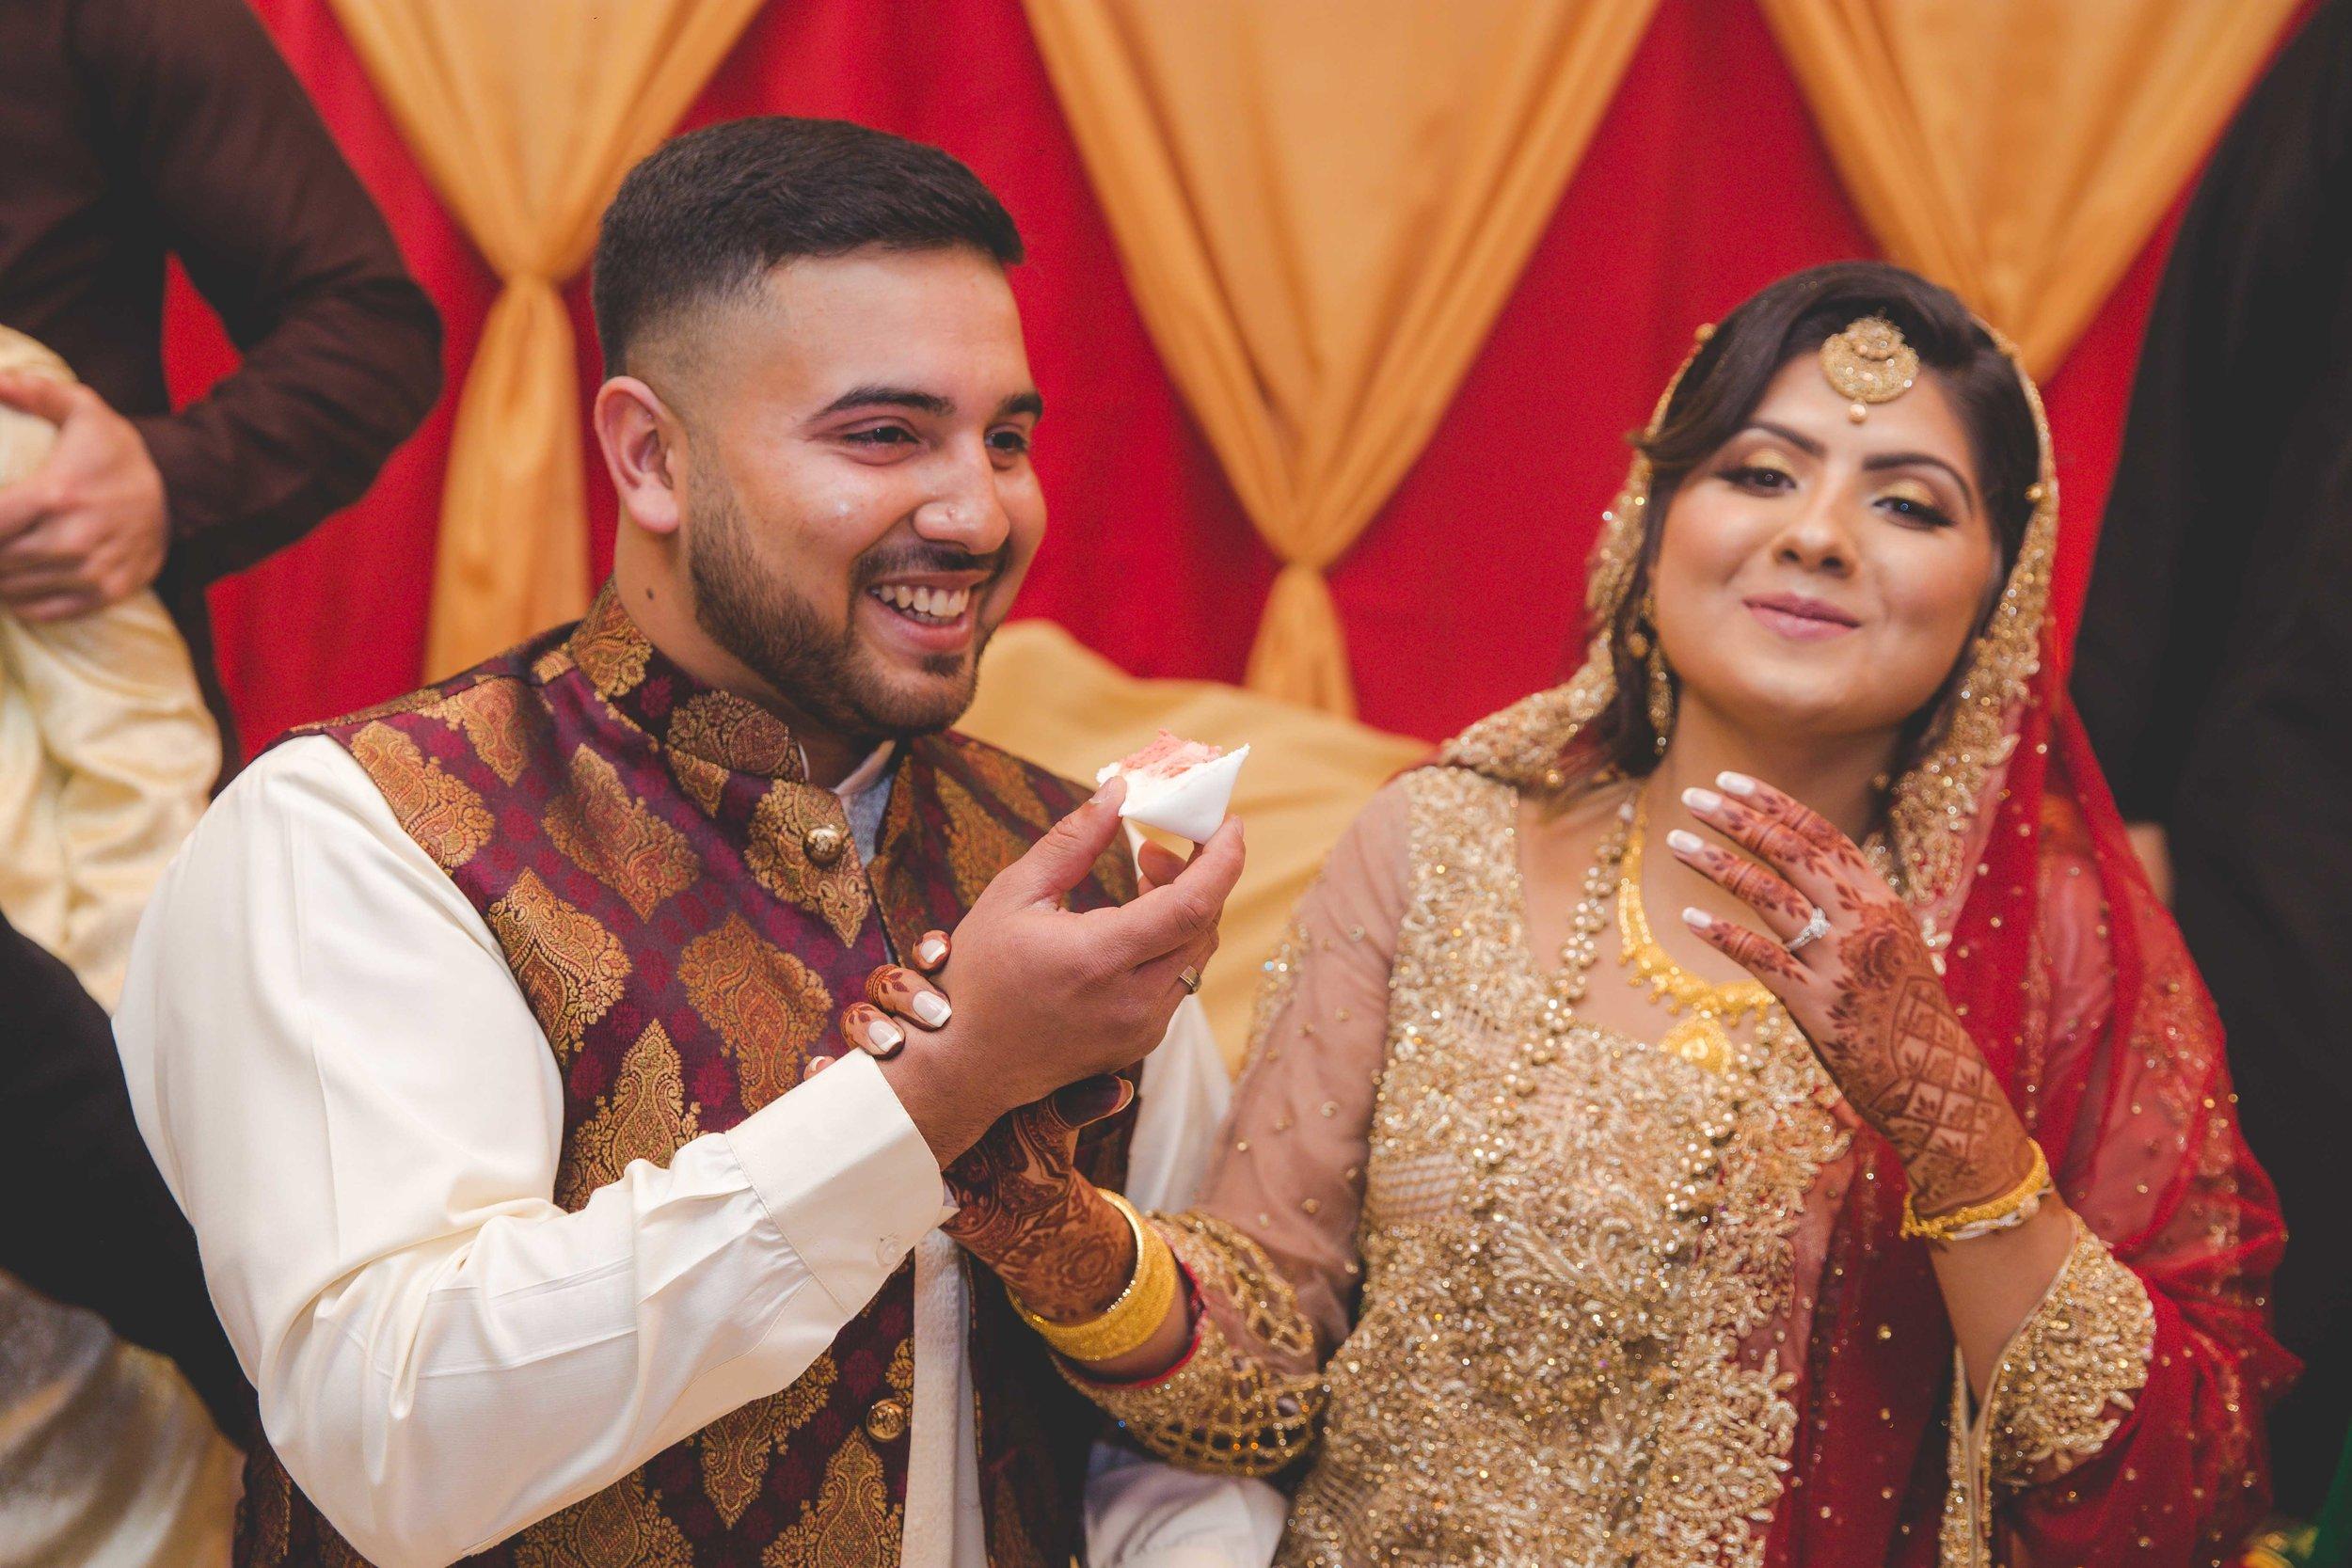 pakistani-wedding-photographer-brooklyn-new-york-26.jpg